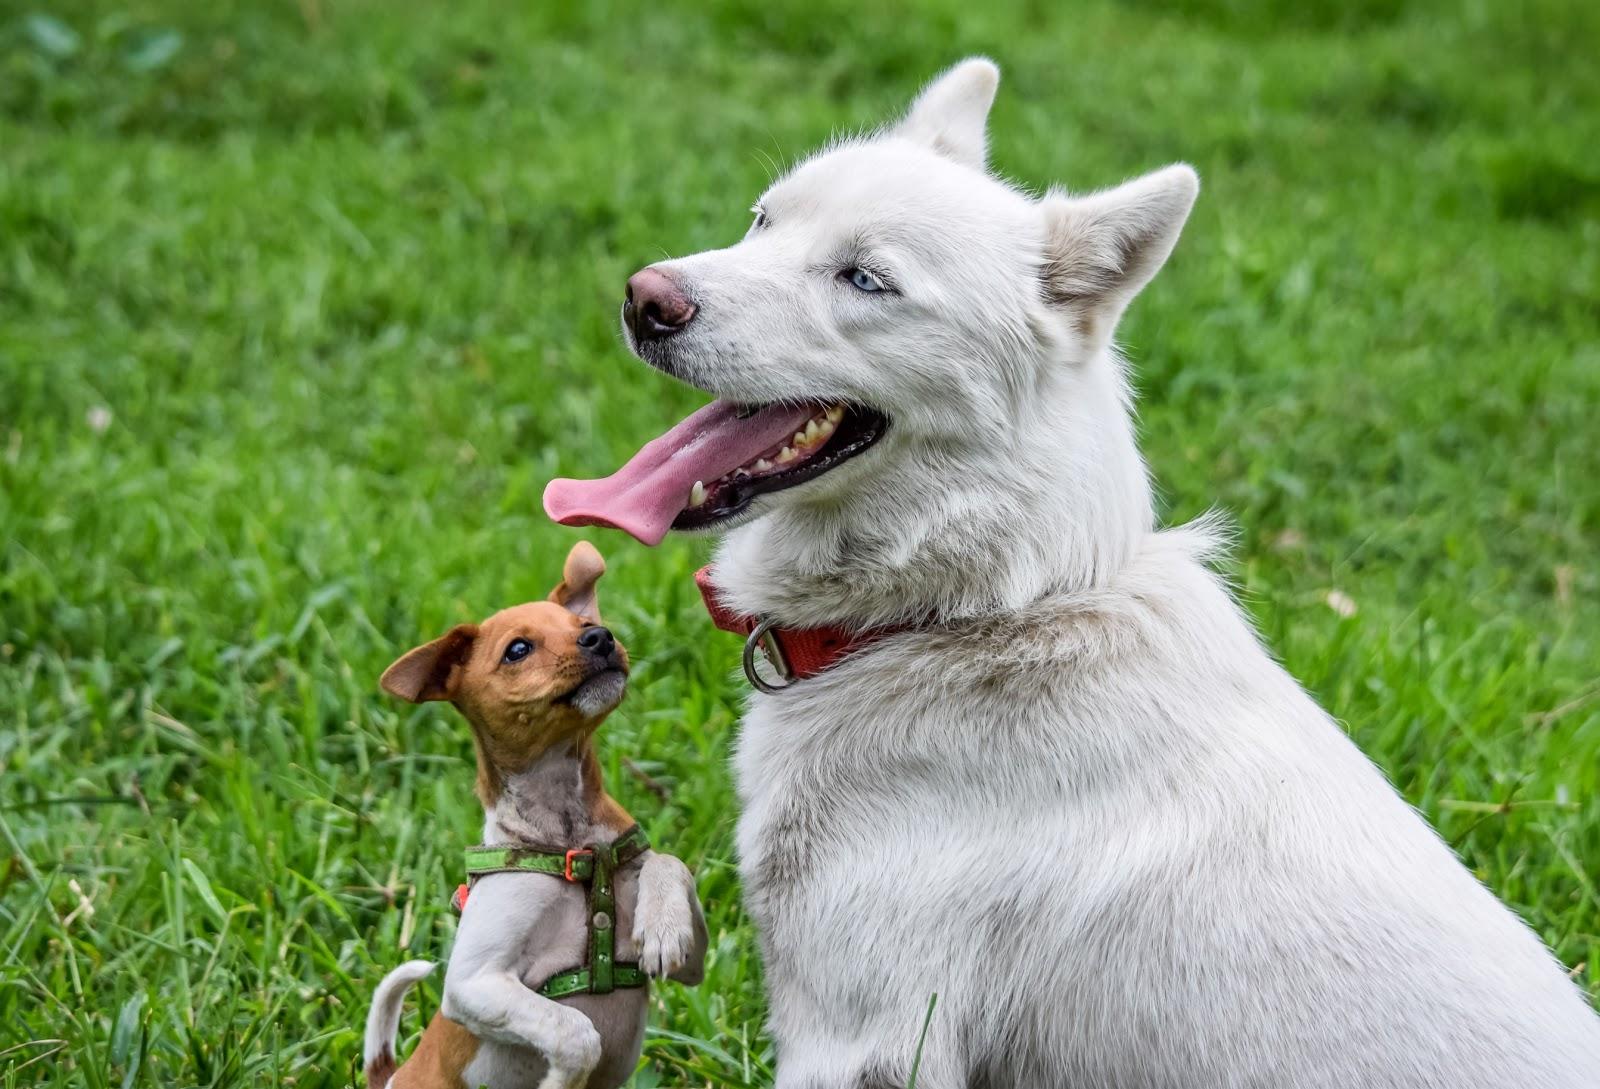 Usaa Pet insurance